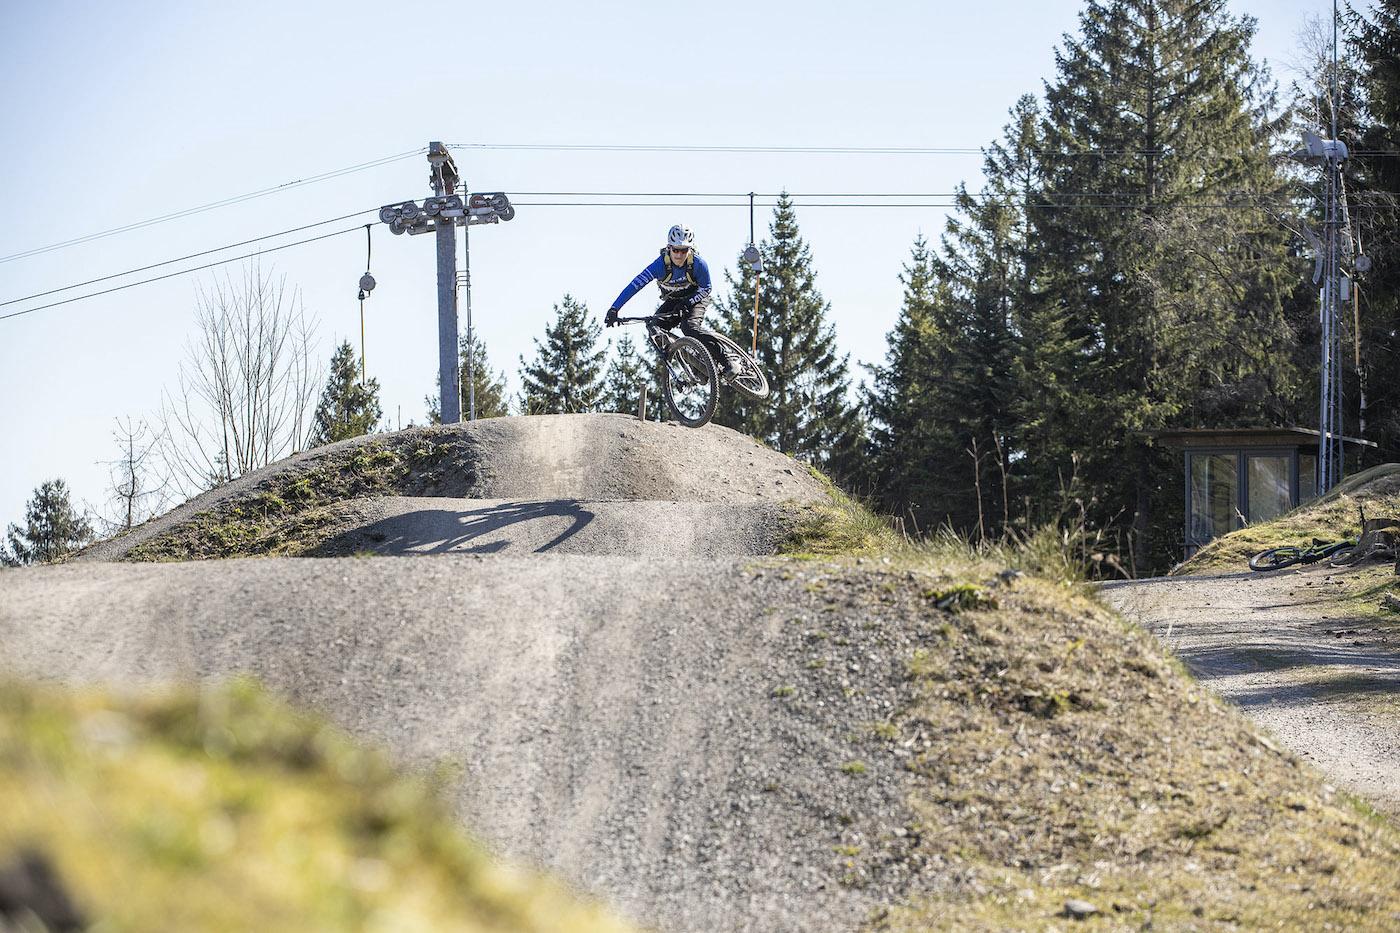 MTB Sprung & Drop Kurs im Trailpark Erbeskopf - Fahrtechnik Training Rock my Trail Bikeschule - 1